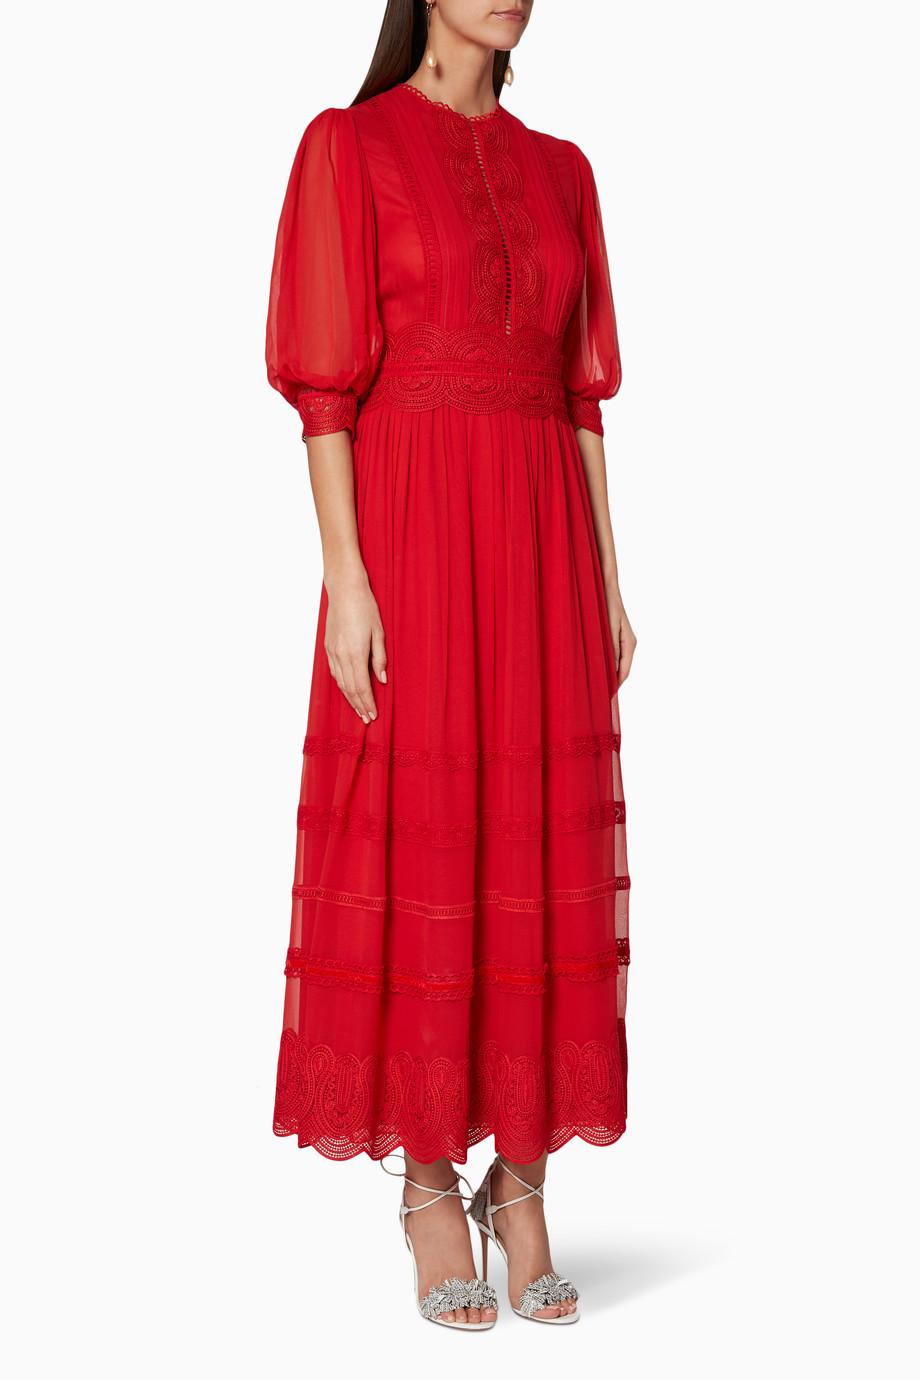 Shop Costarellos Red Red Scalloped Lace Trim Maxi Dress